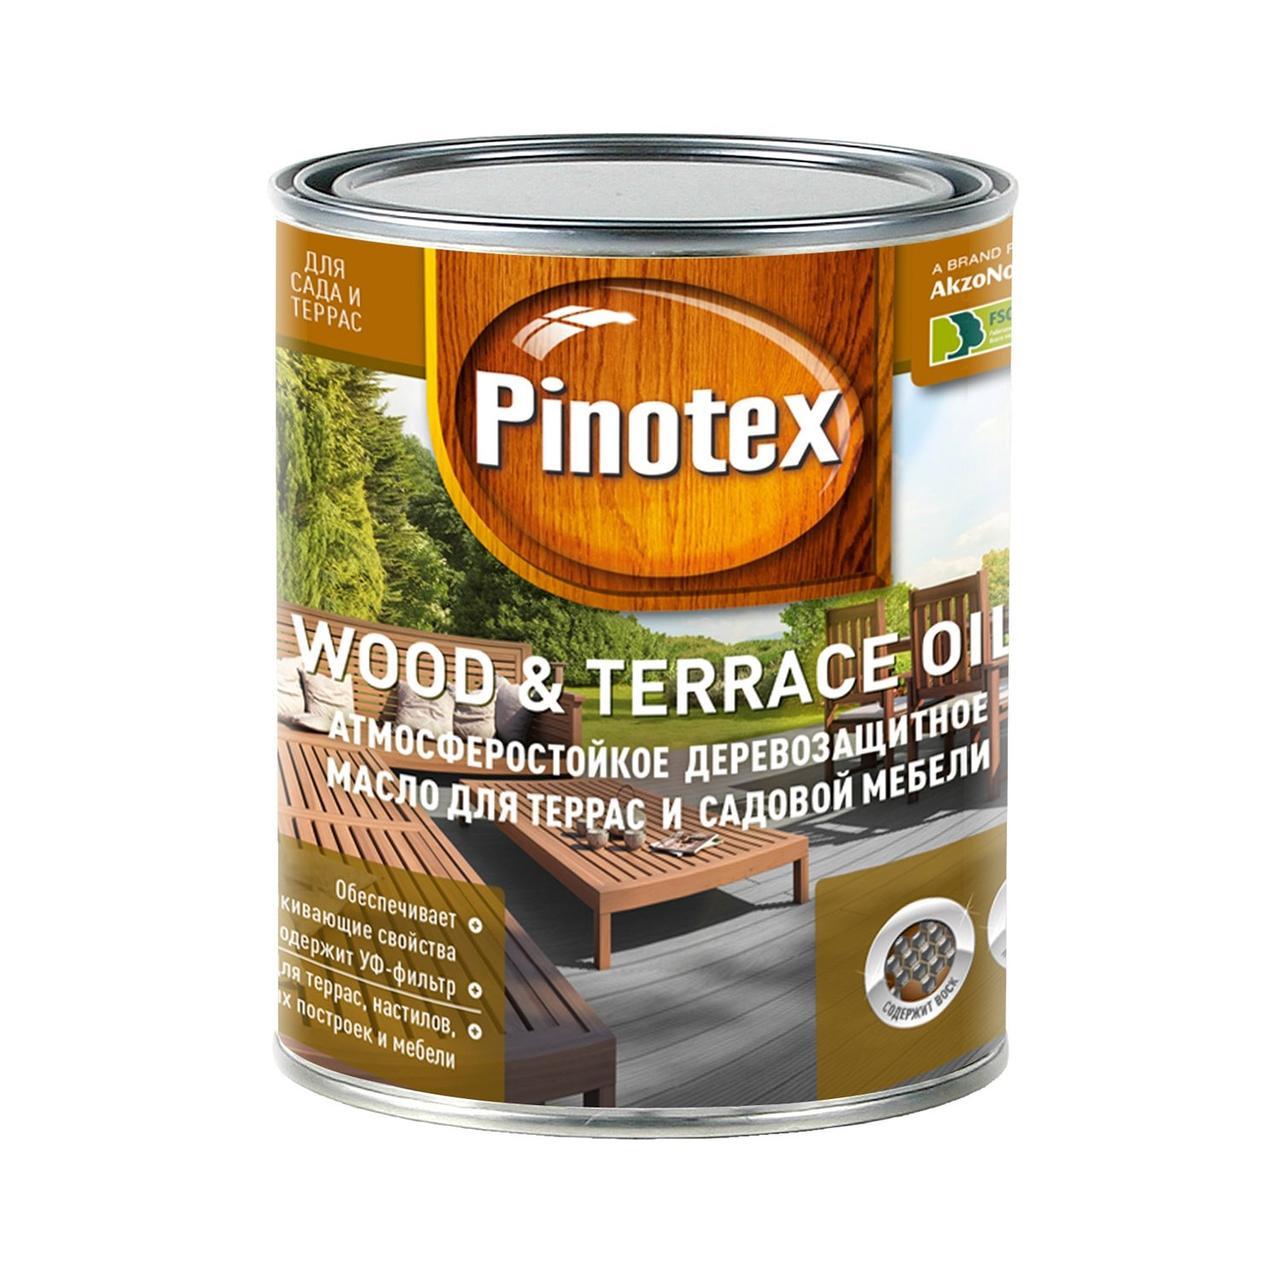 Масло для террас Pinotex Wood & Terrace Oil 1л